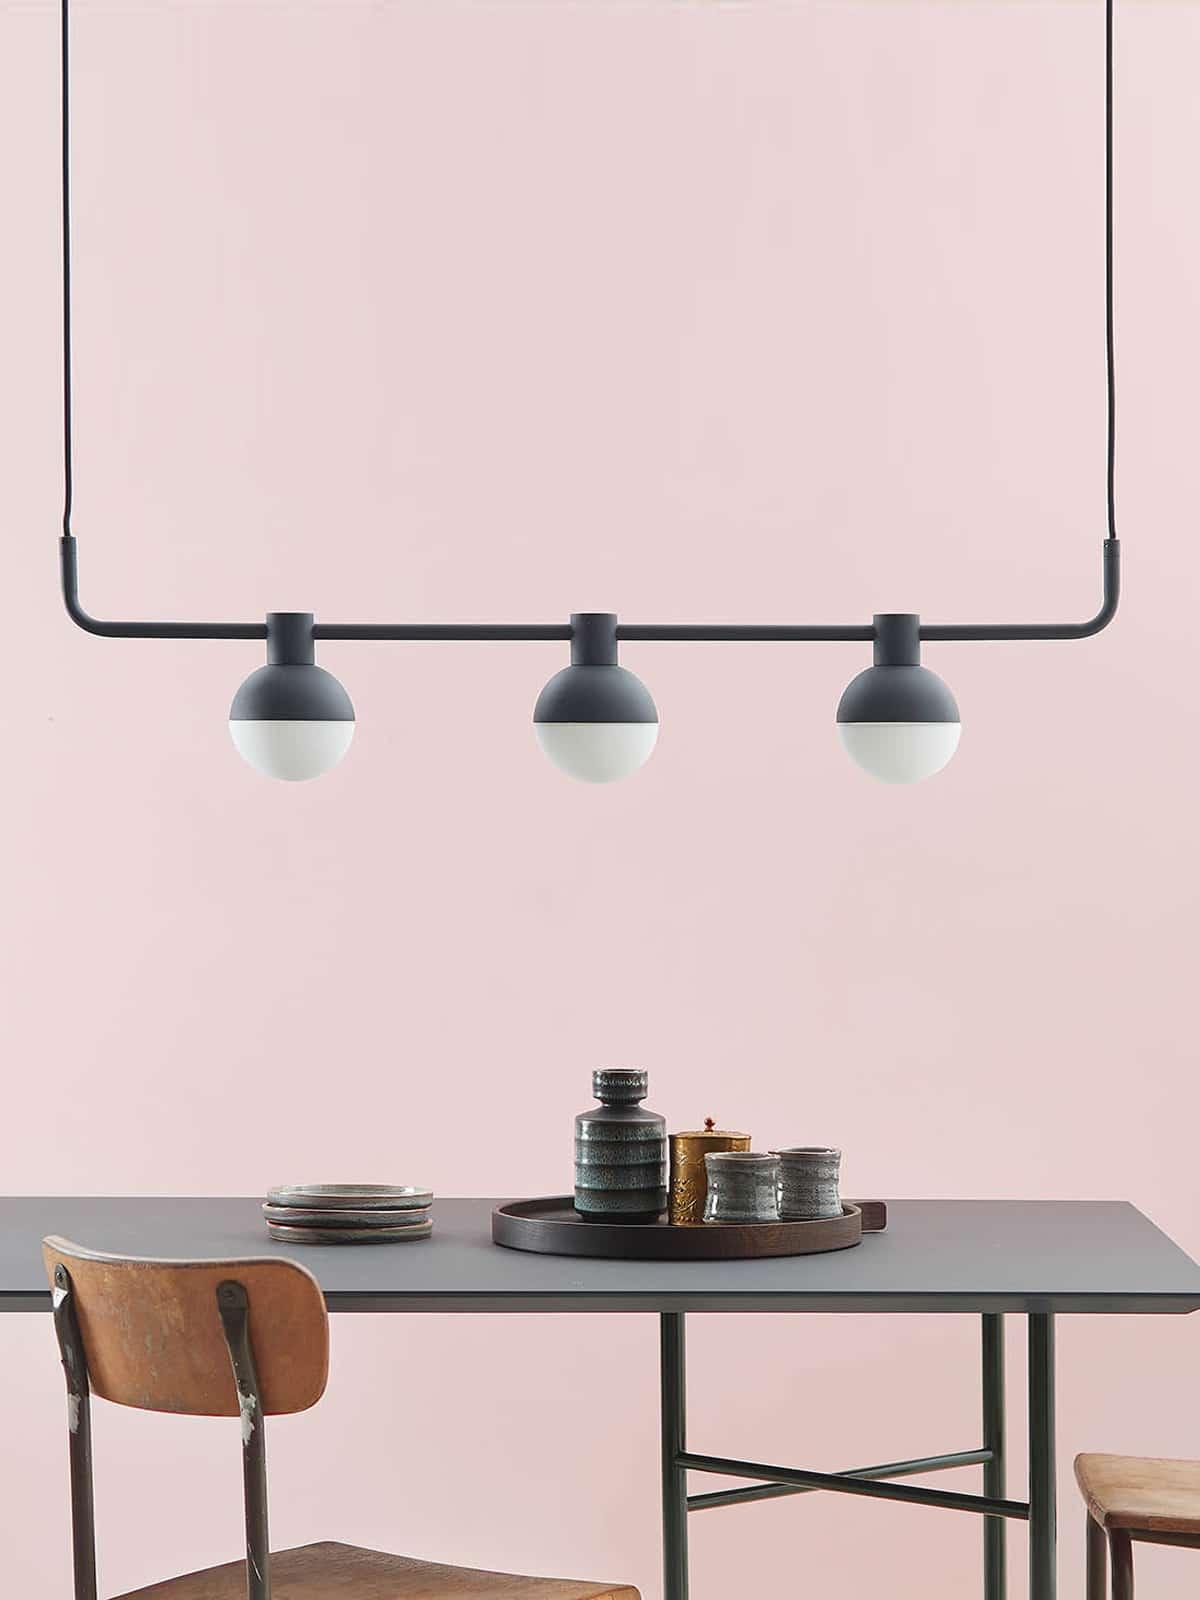 dreiflammige designerleuchten lampen leuchten. Black Bedroom Furniture Sets. Home Design Ideas